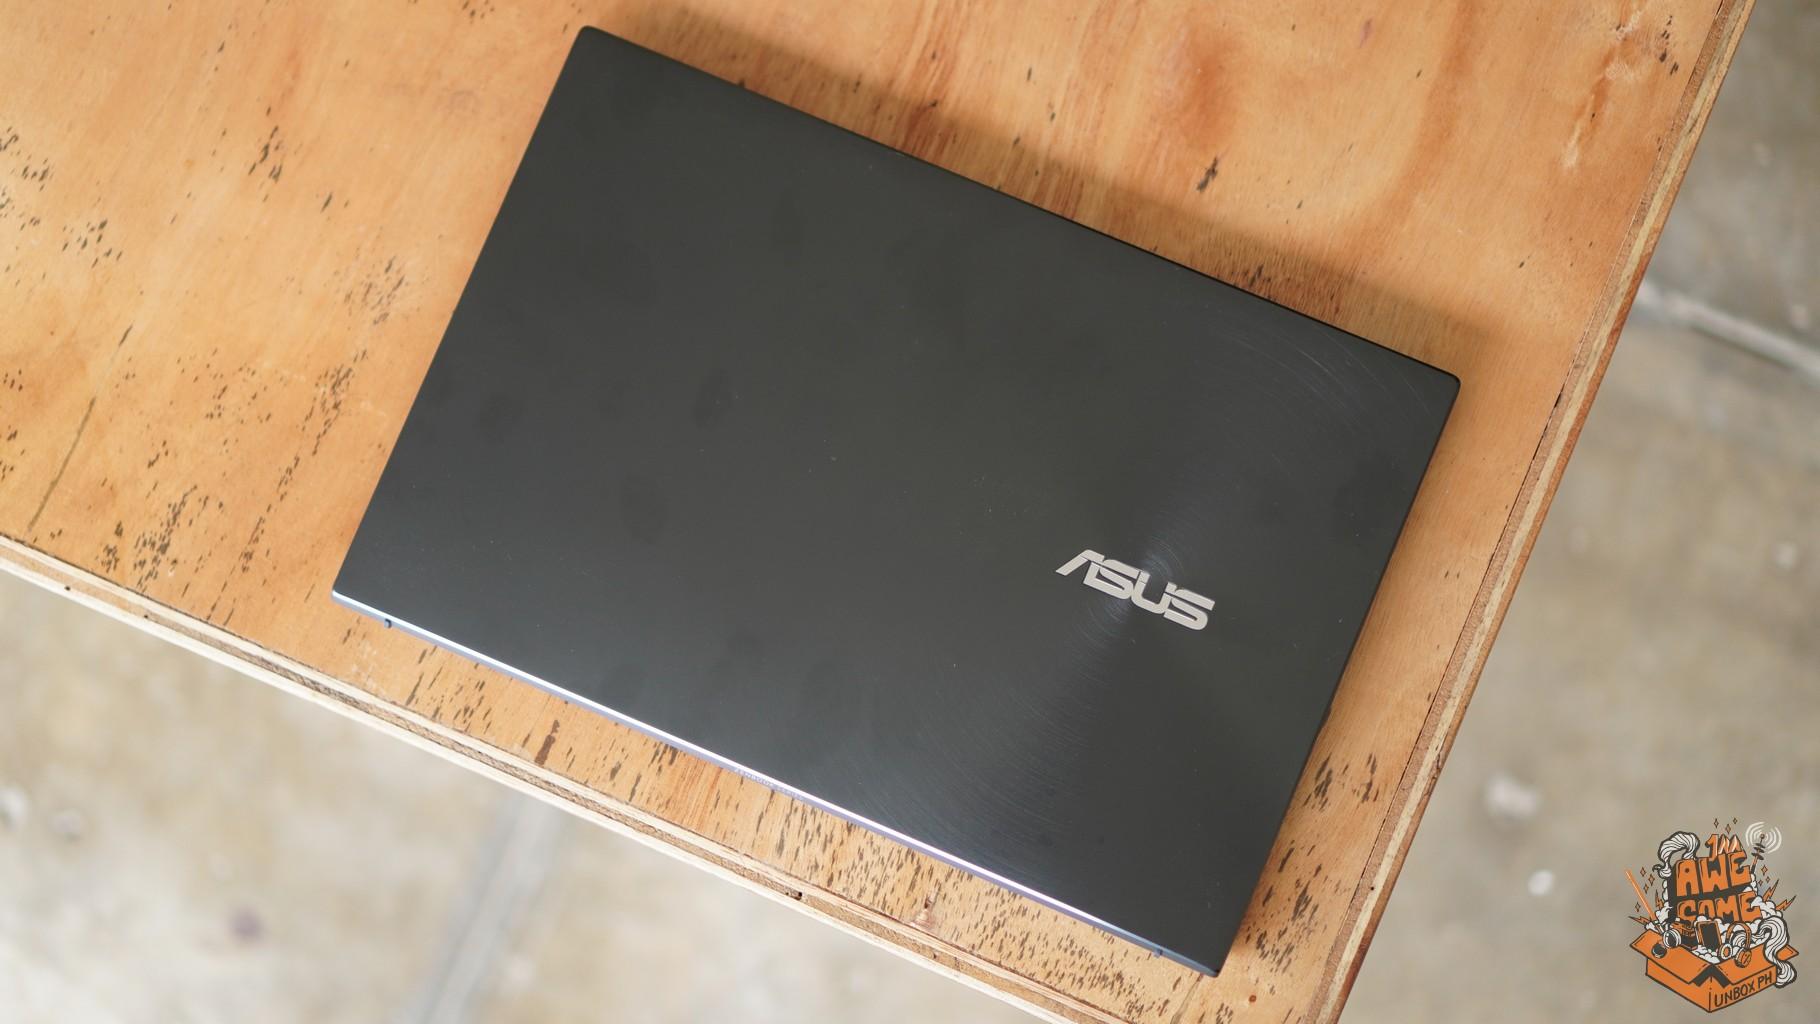 ASUS ZenBook 13 UX325EA Review Philippines